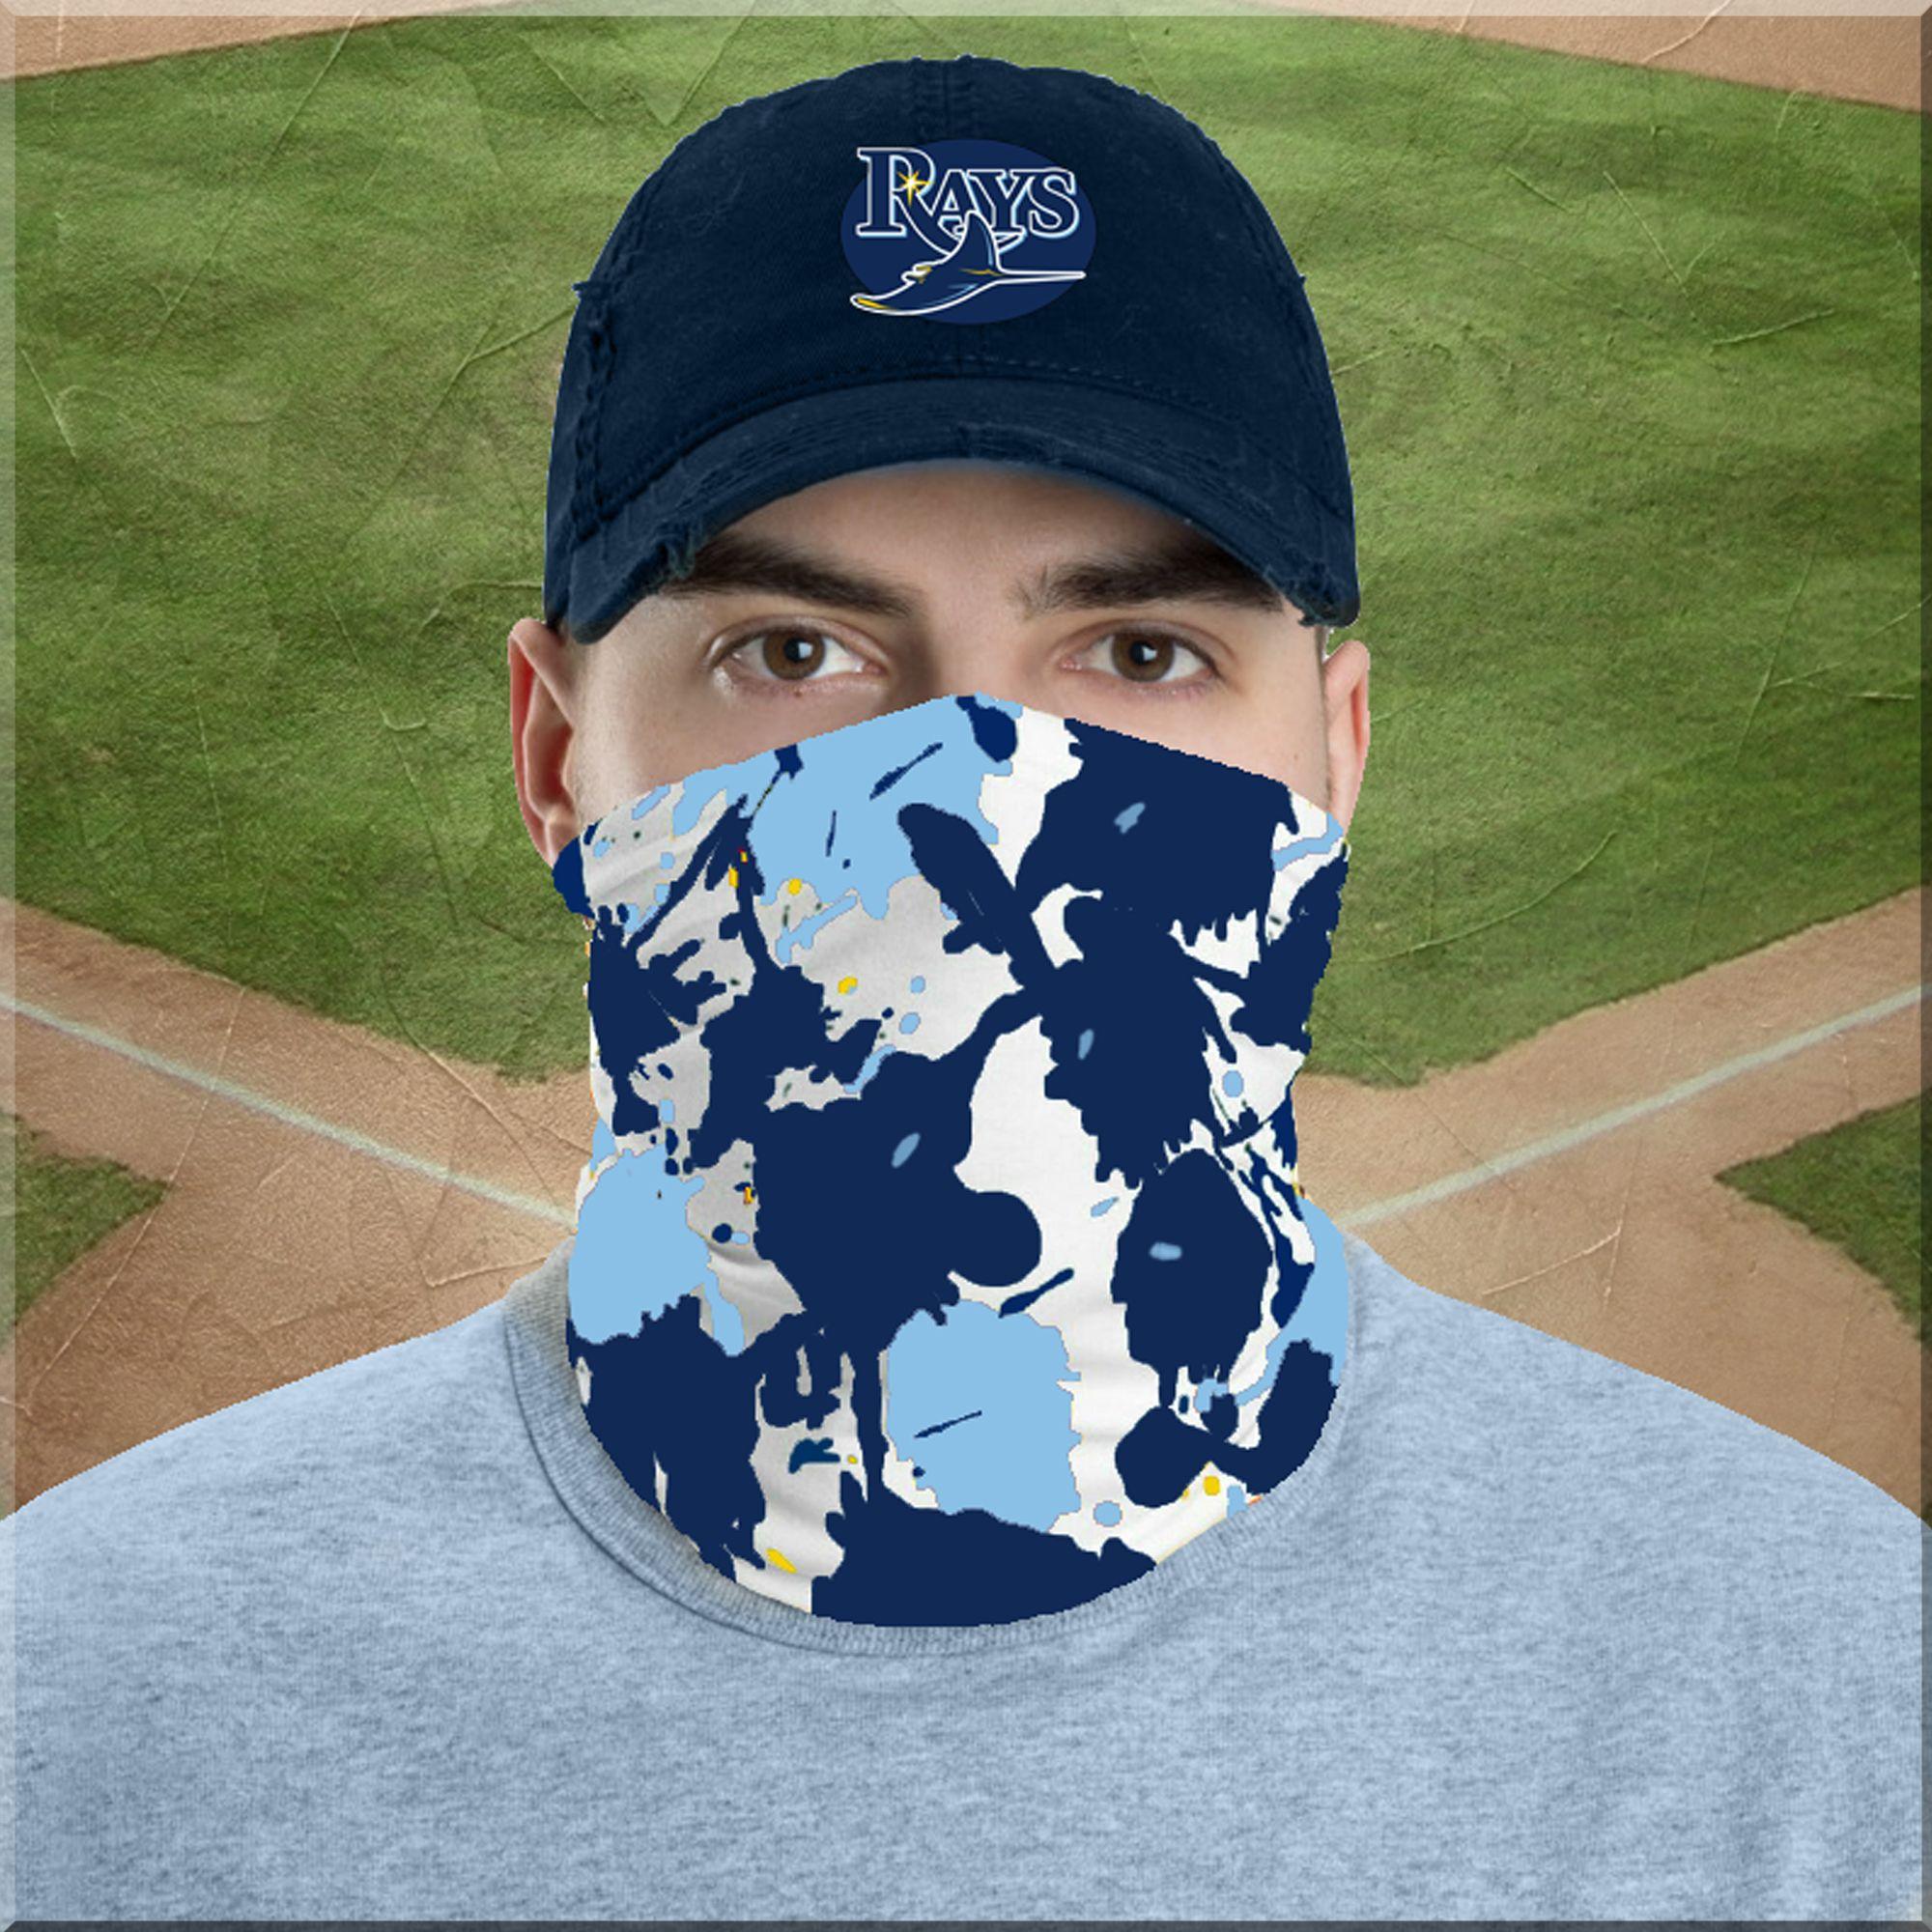 Al East Mlbaseball Rays Orioles Bluejays Redsox Yankees Inspired Neckgaiter Facecover Headband Facemask Urban Fashion In 2020 Urban Fashion Face Mask Neck Gaiter